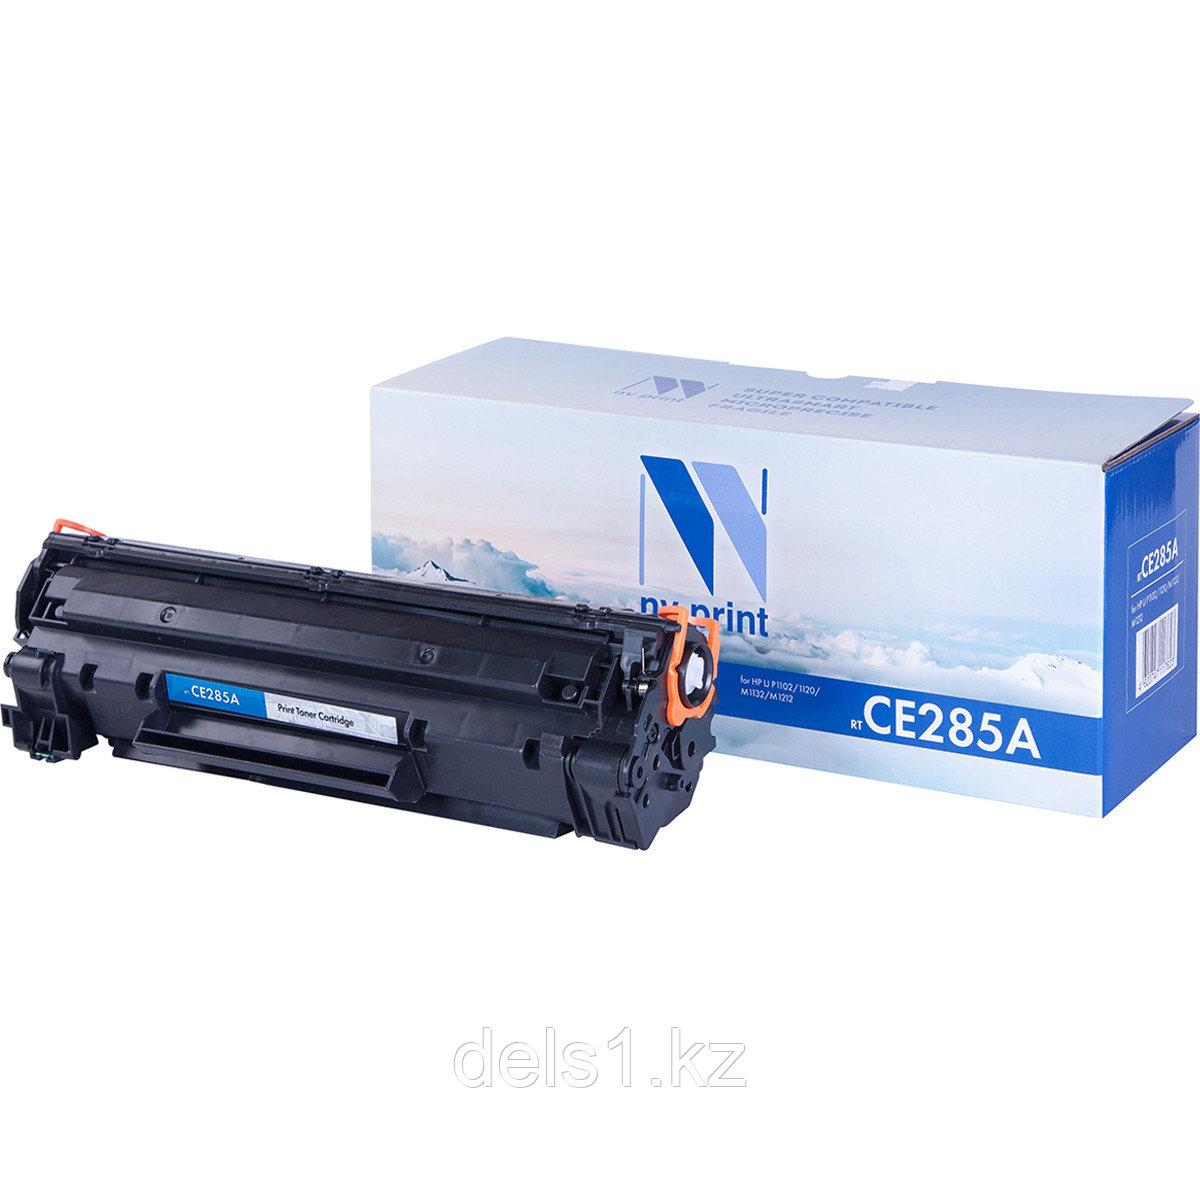 Картридж NVP NV-CE285A совместимый c HP LaserJe Pro P1102 | P1102w | M1132 | M1212nf | М1217